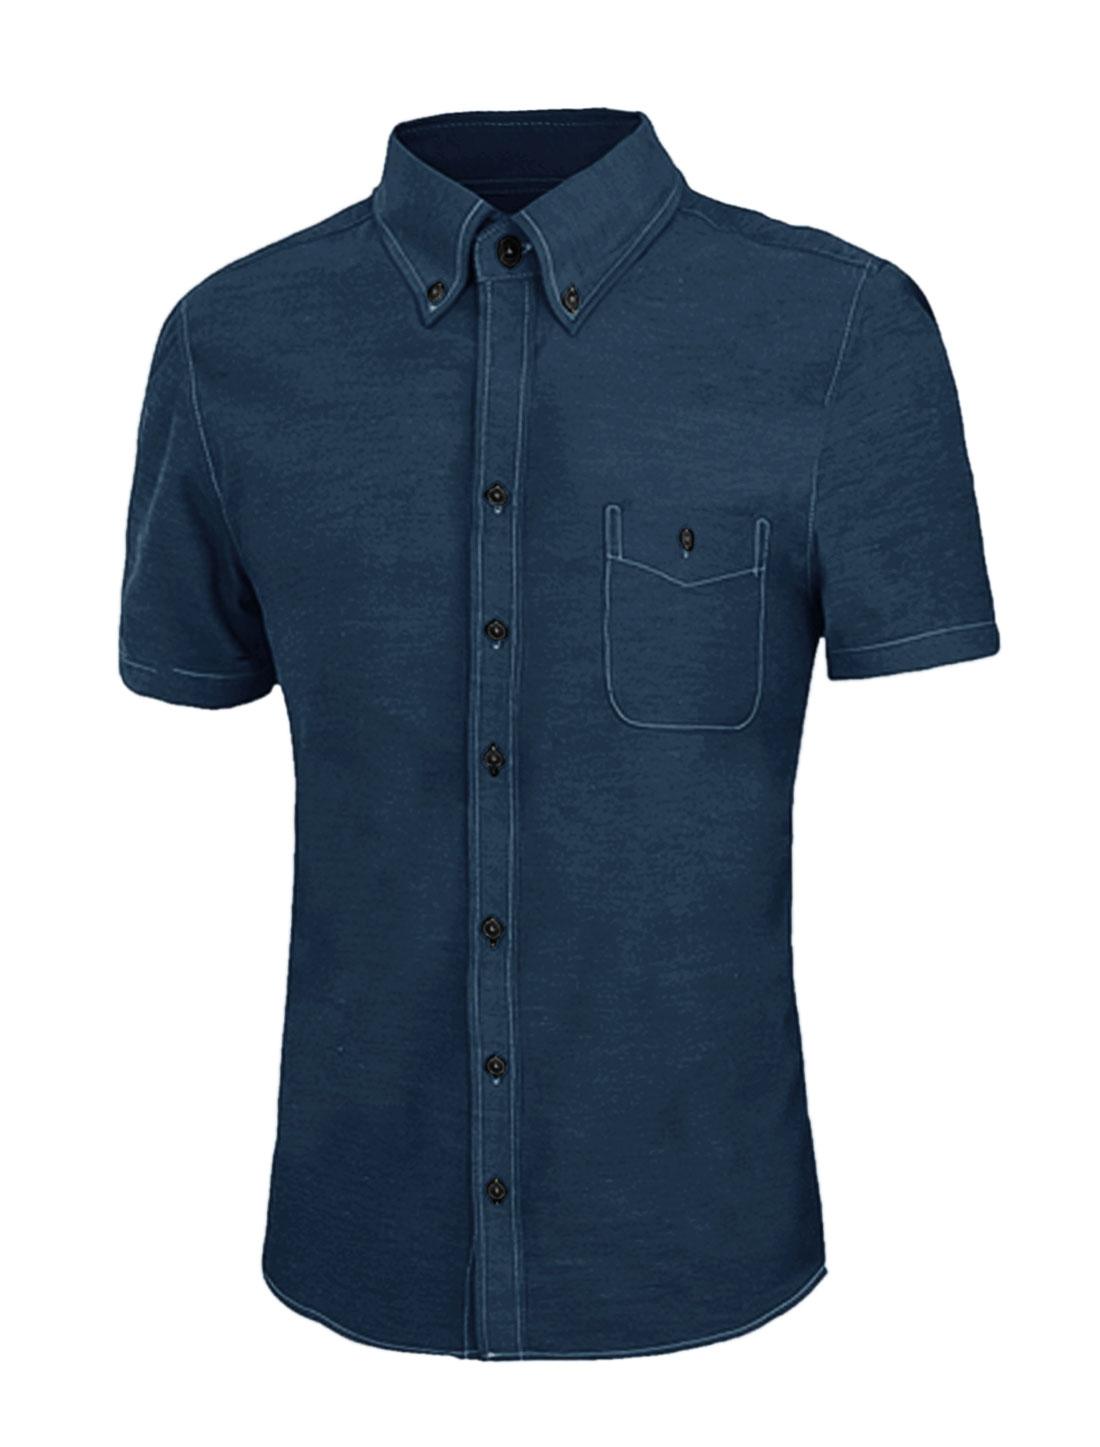 Men Short Sleeve Button Down Pocket Shirt Dark Blue M